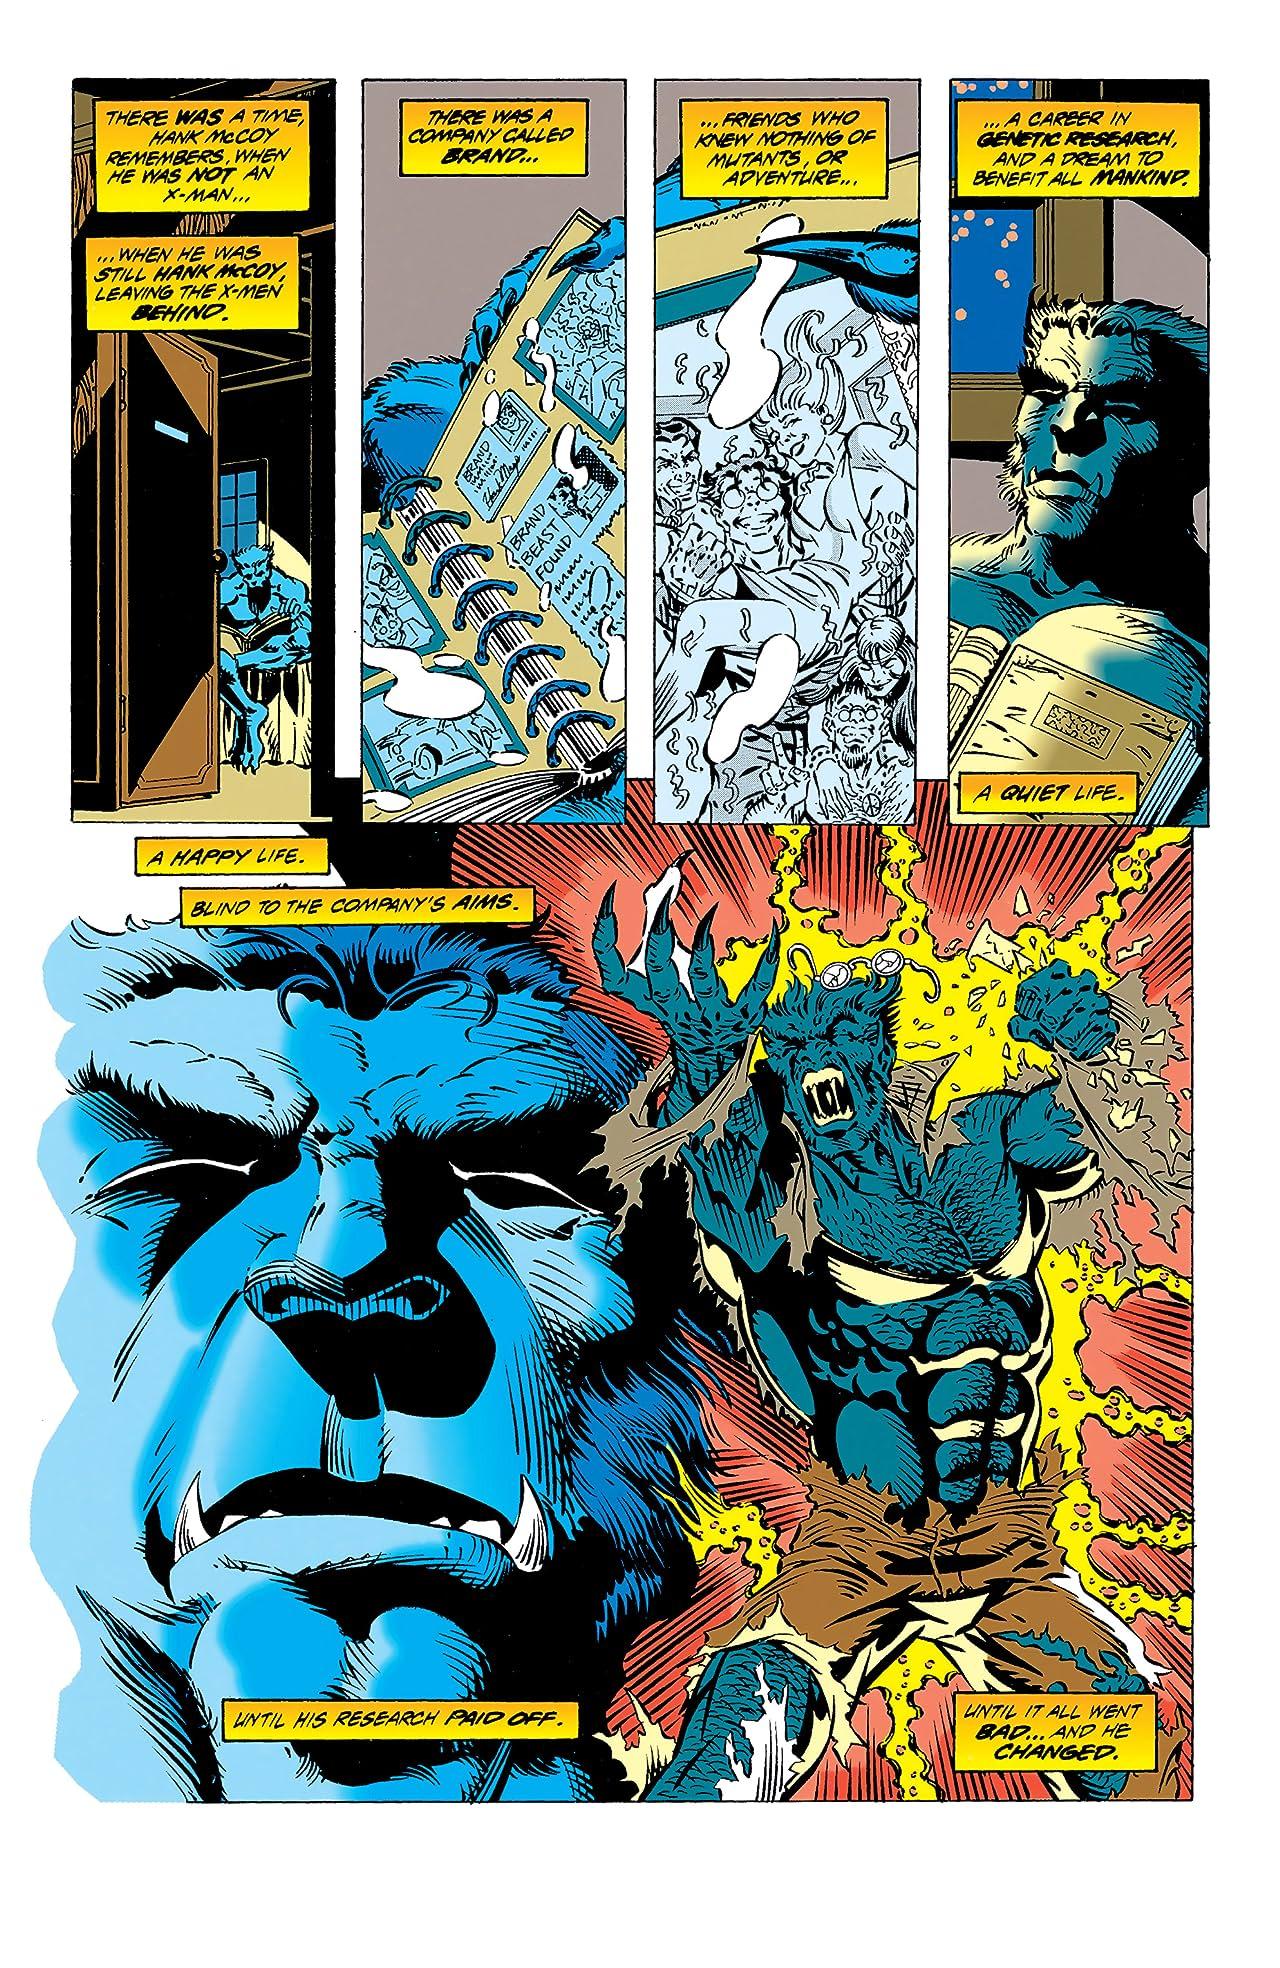 Spider-Man: The Mutant Agenda (1994) #1